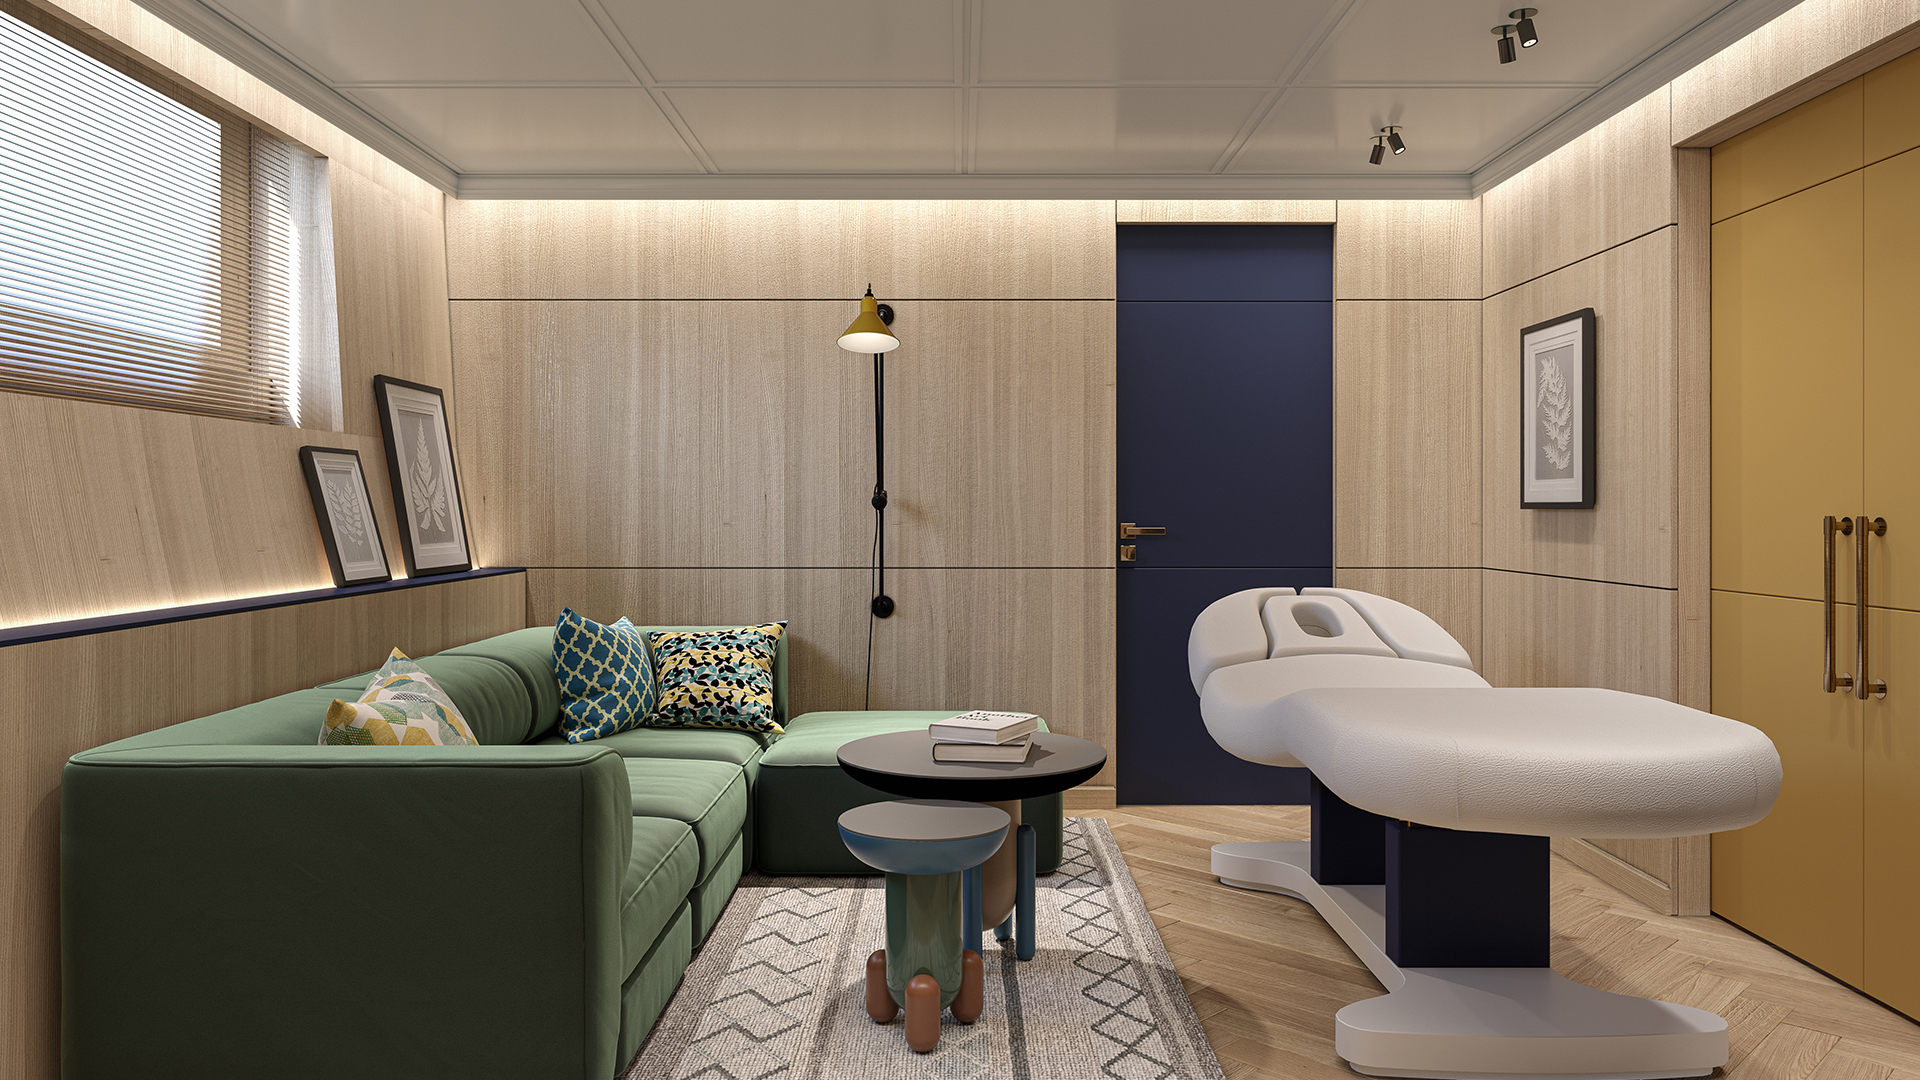 Maayan-Golan_Architectural-Visualization_interior-visualization_yacht-design_guest-room_design-by-rust_02